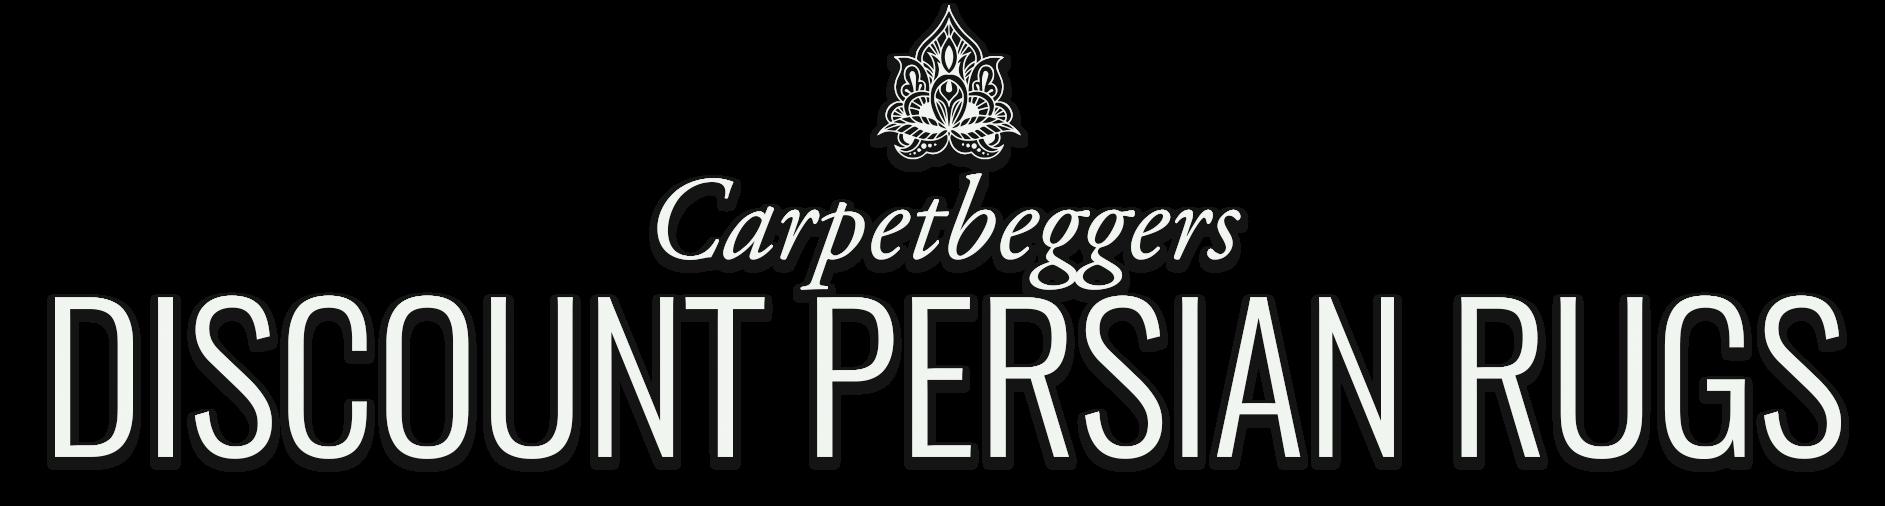 Carpetbeggers